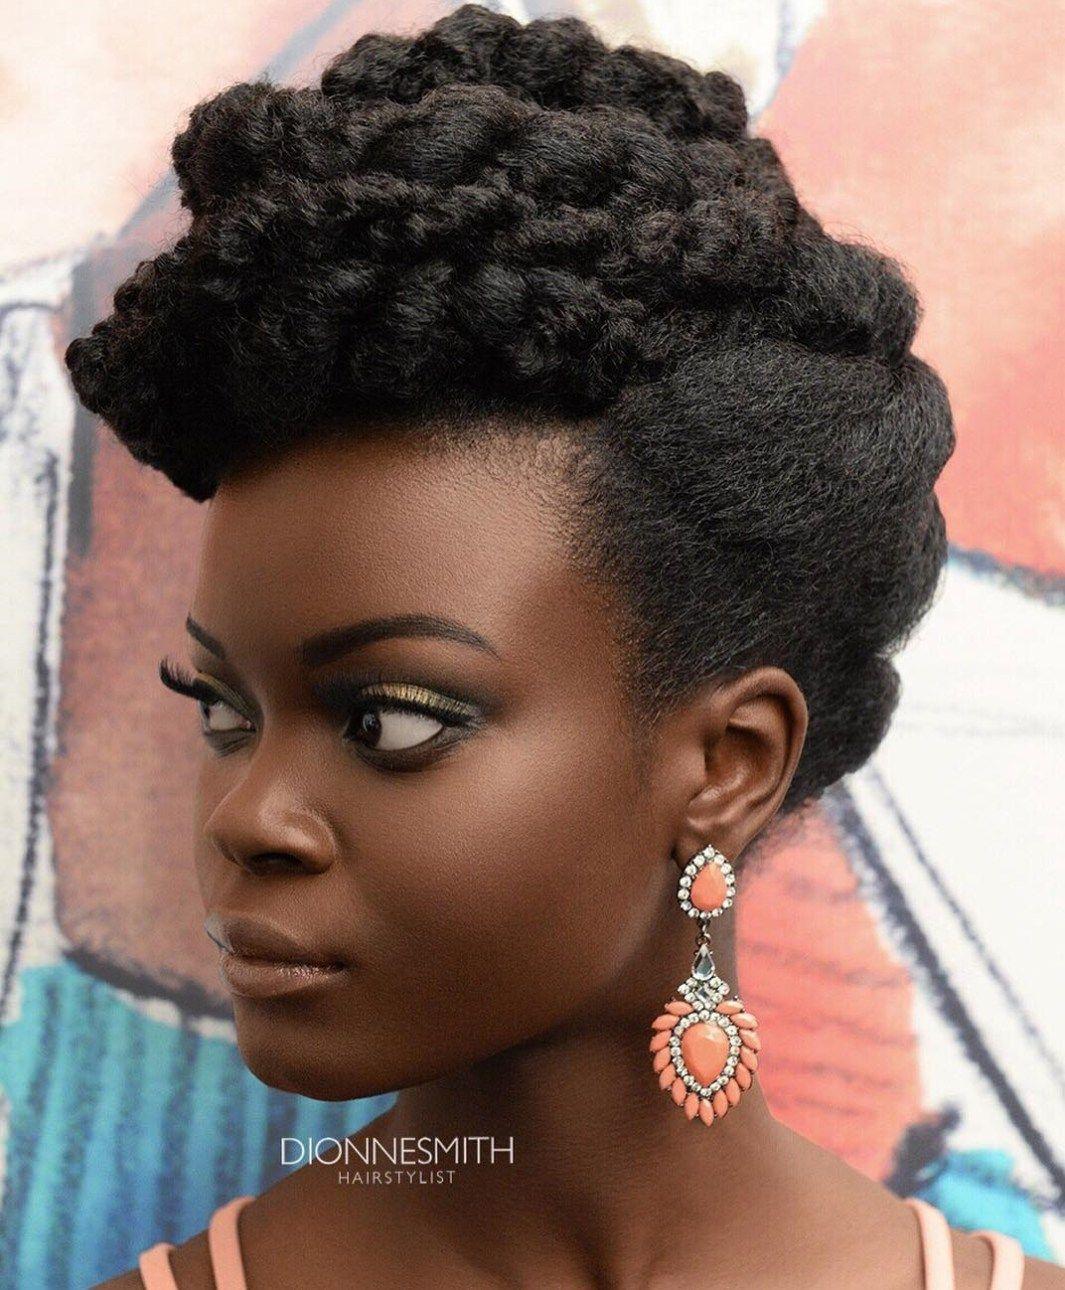 Natural black hairstyles for women hairstyleforblackwomen.net 5